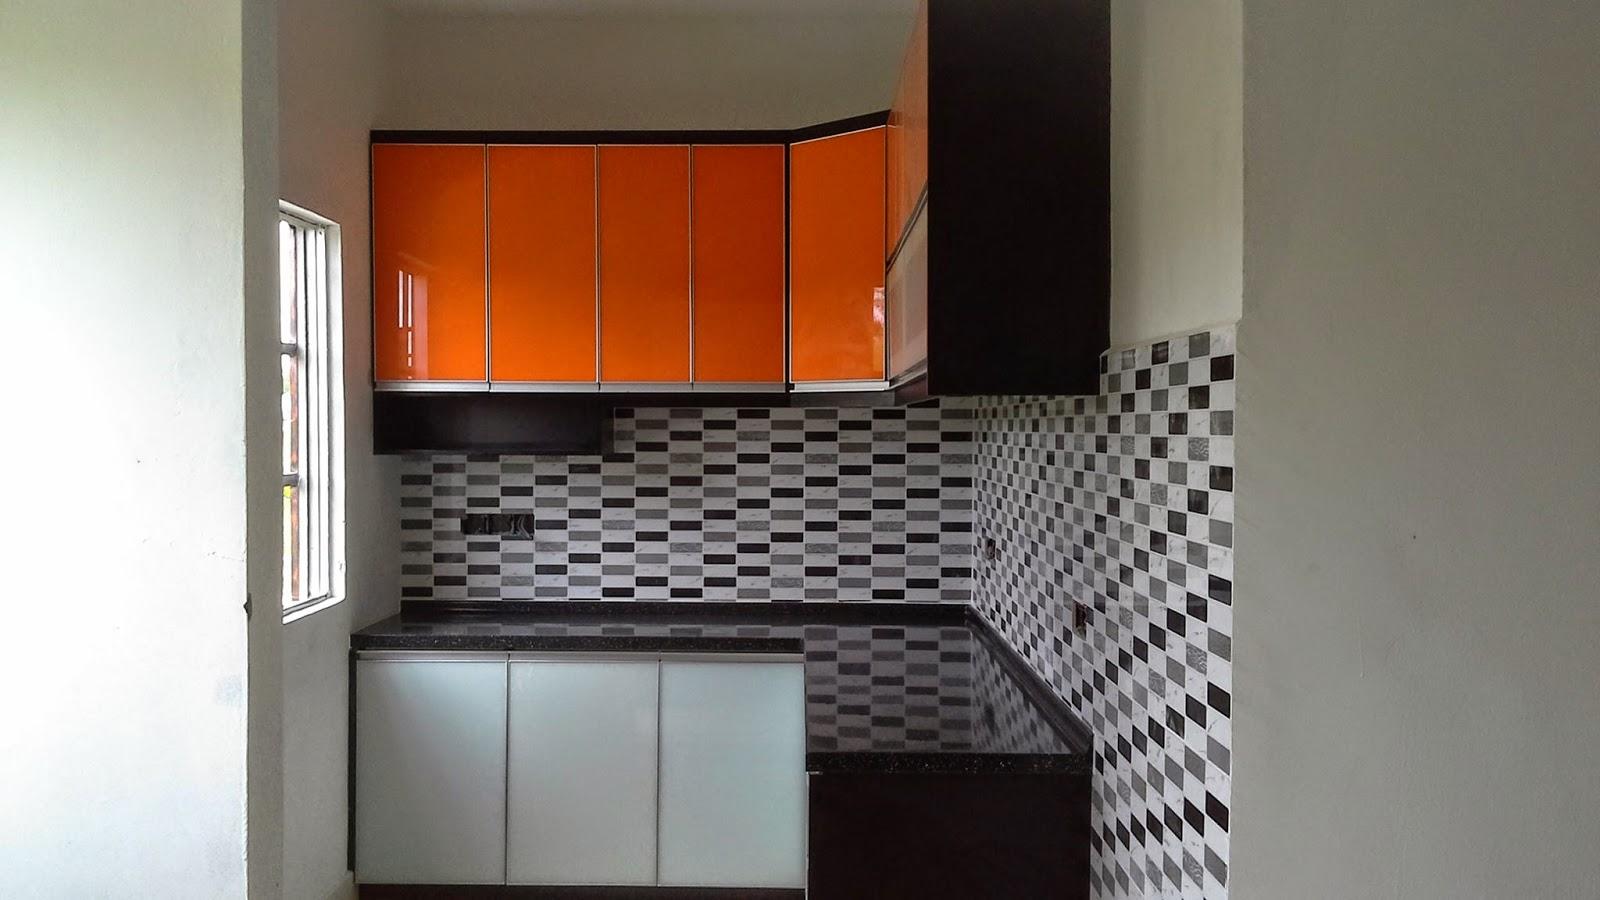 Gambar Lemari Dapur Minimalis